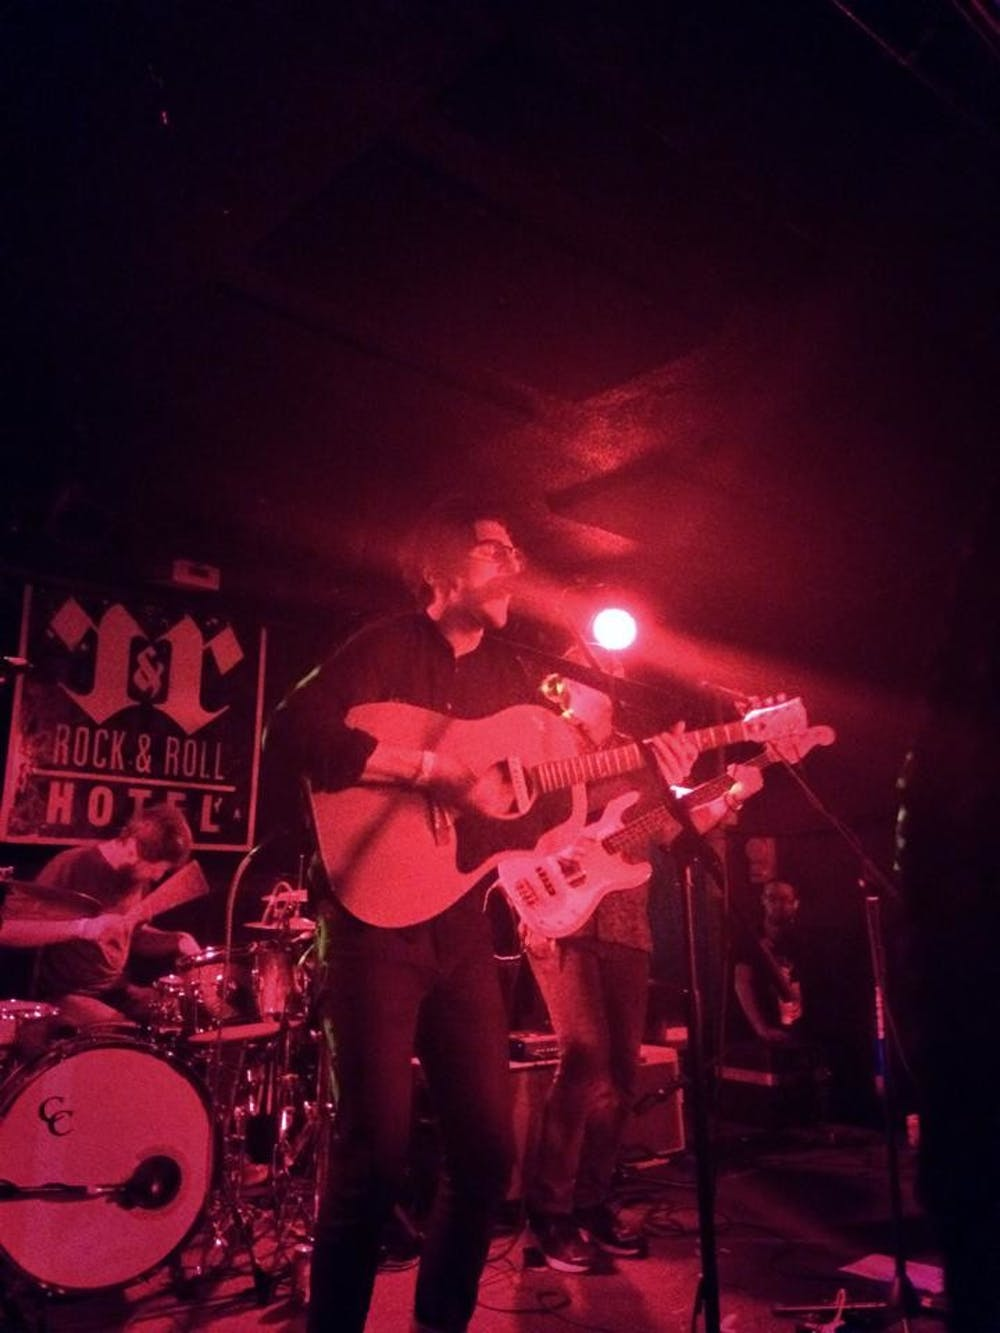 Dan Croll lights up Rock & Roll Hotel